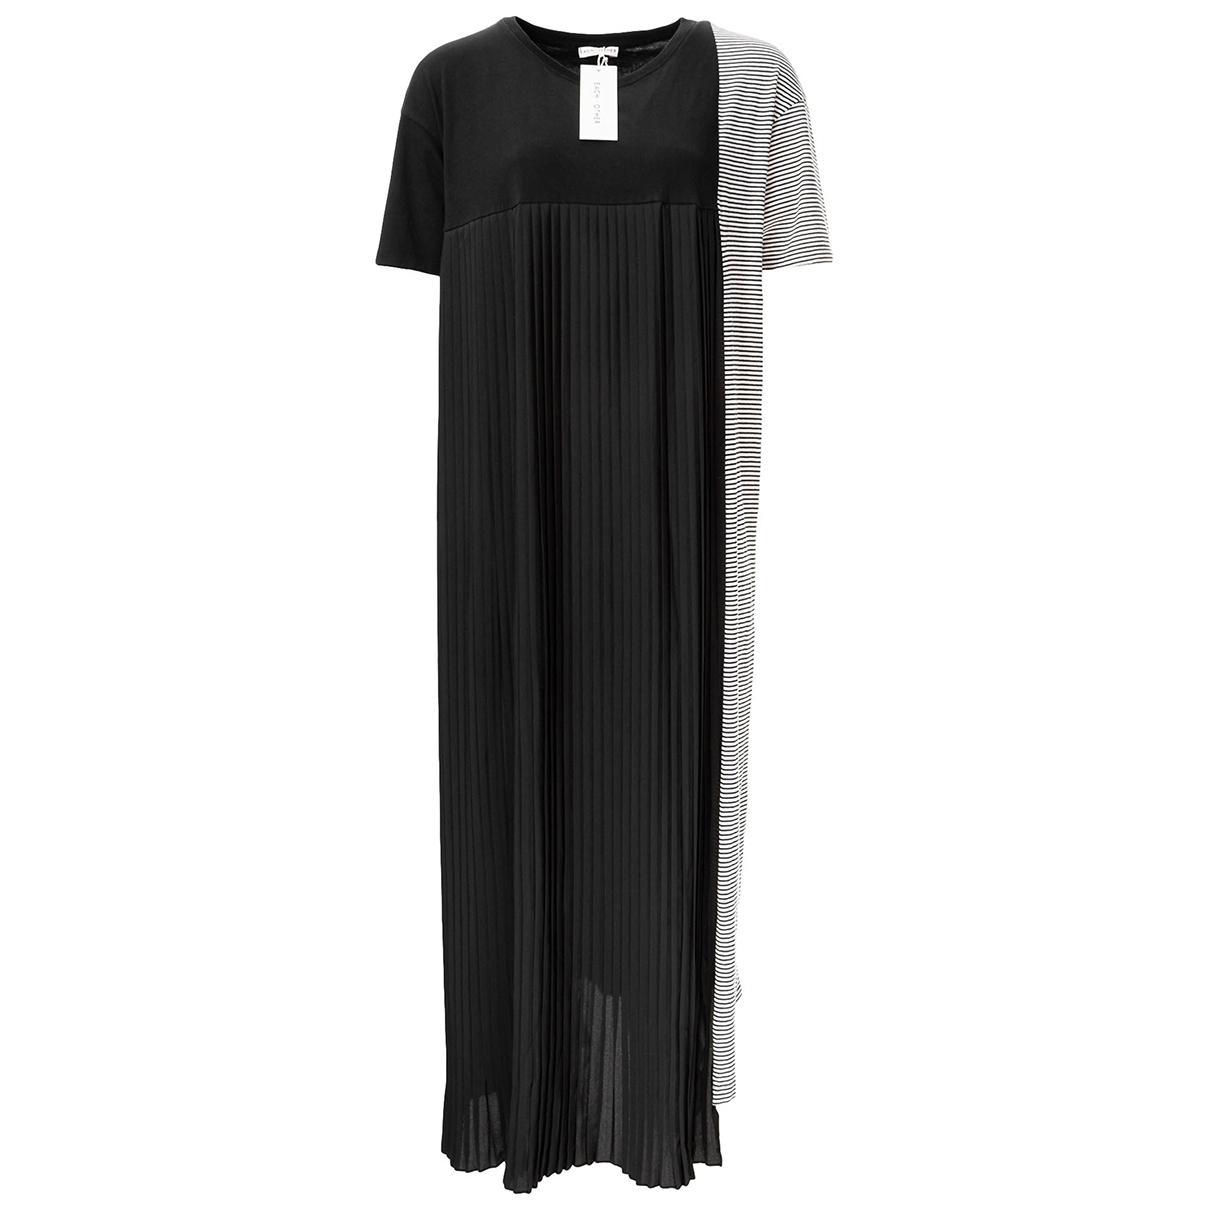 Each X \N Black Cotton dress for Women L International